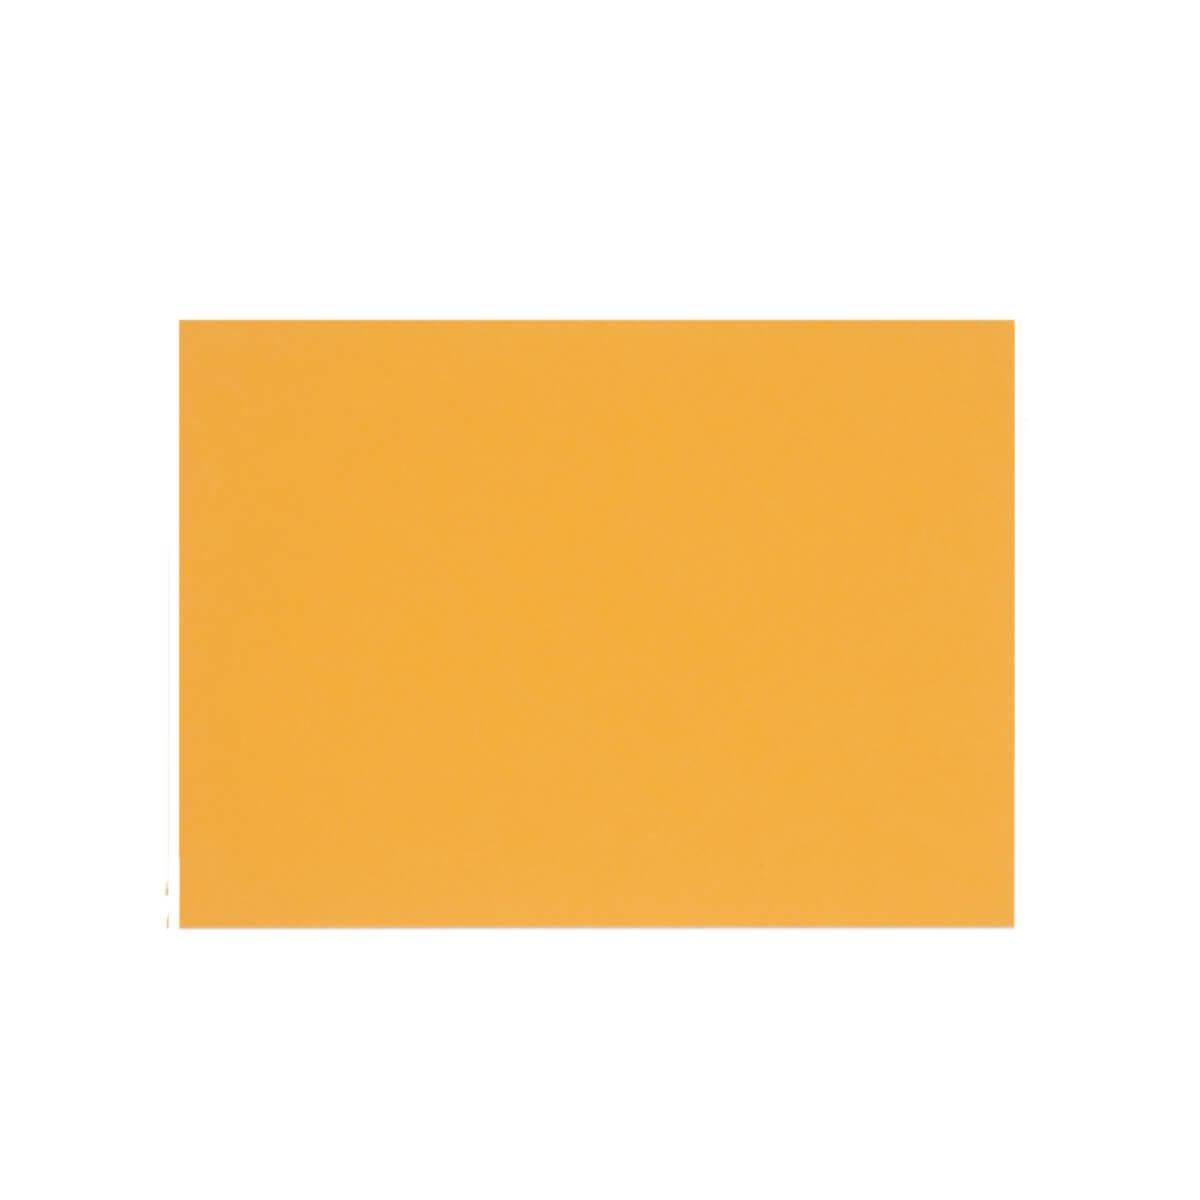 DARK YELLOW 125 x 175mm ENVELOPES